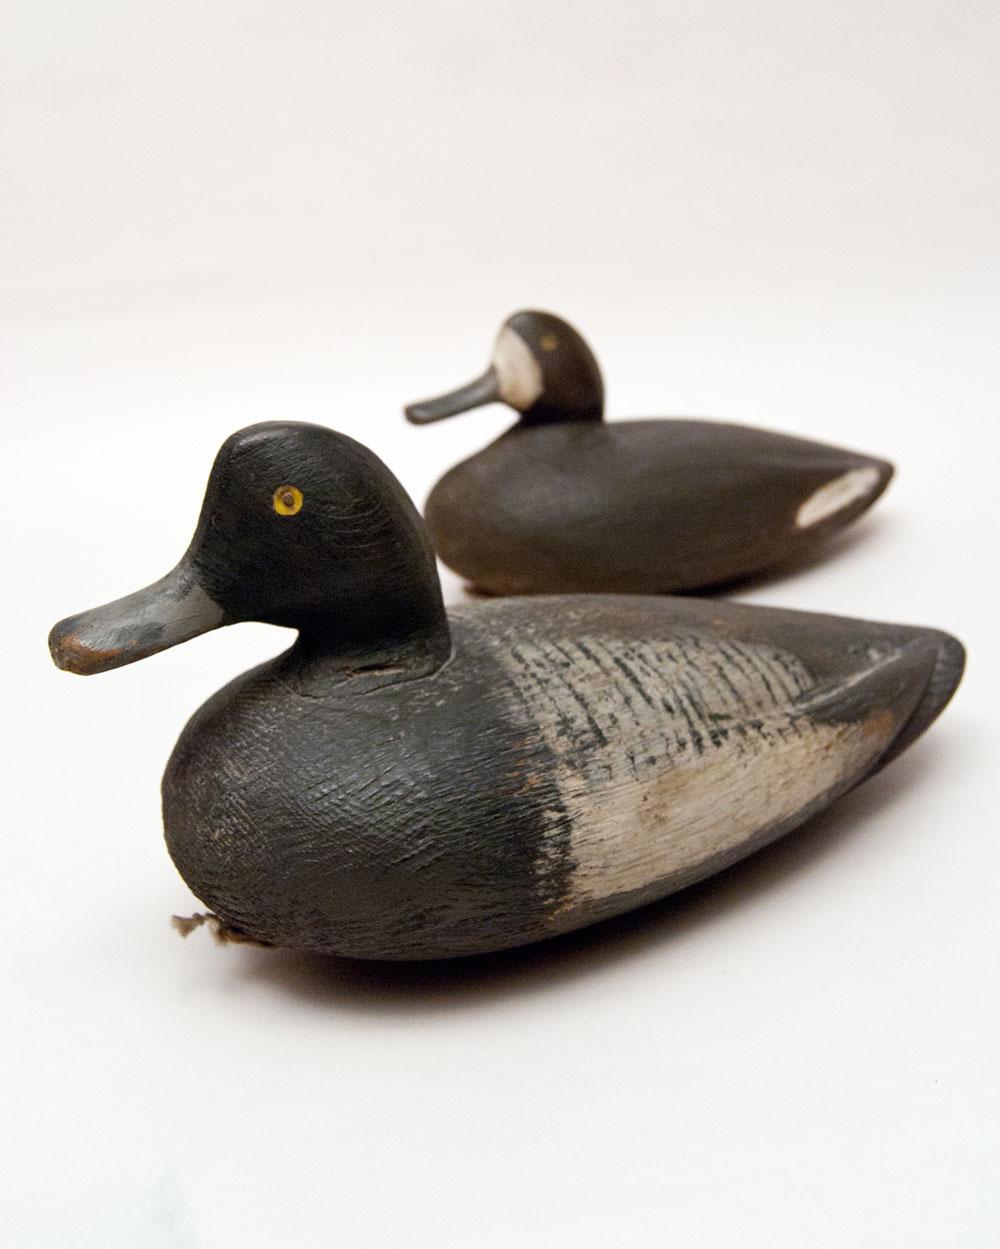 dating wooden duck decoys